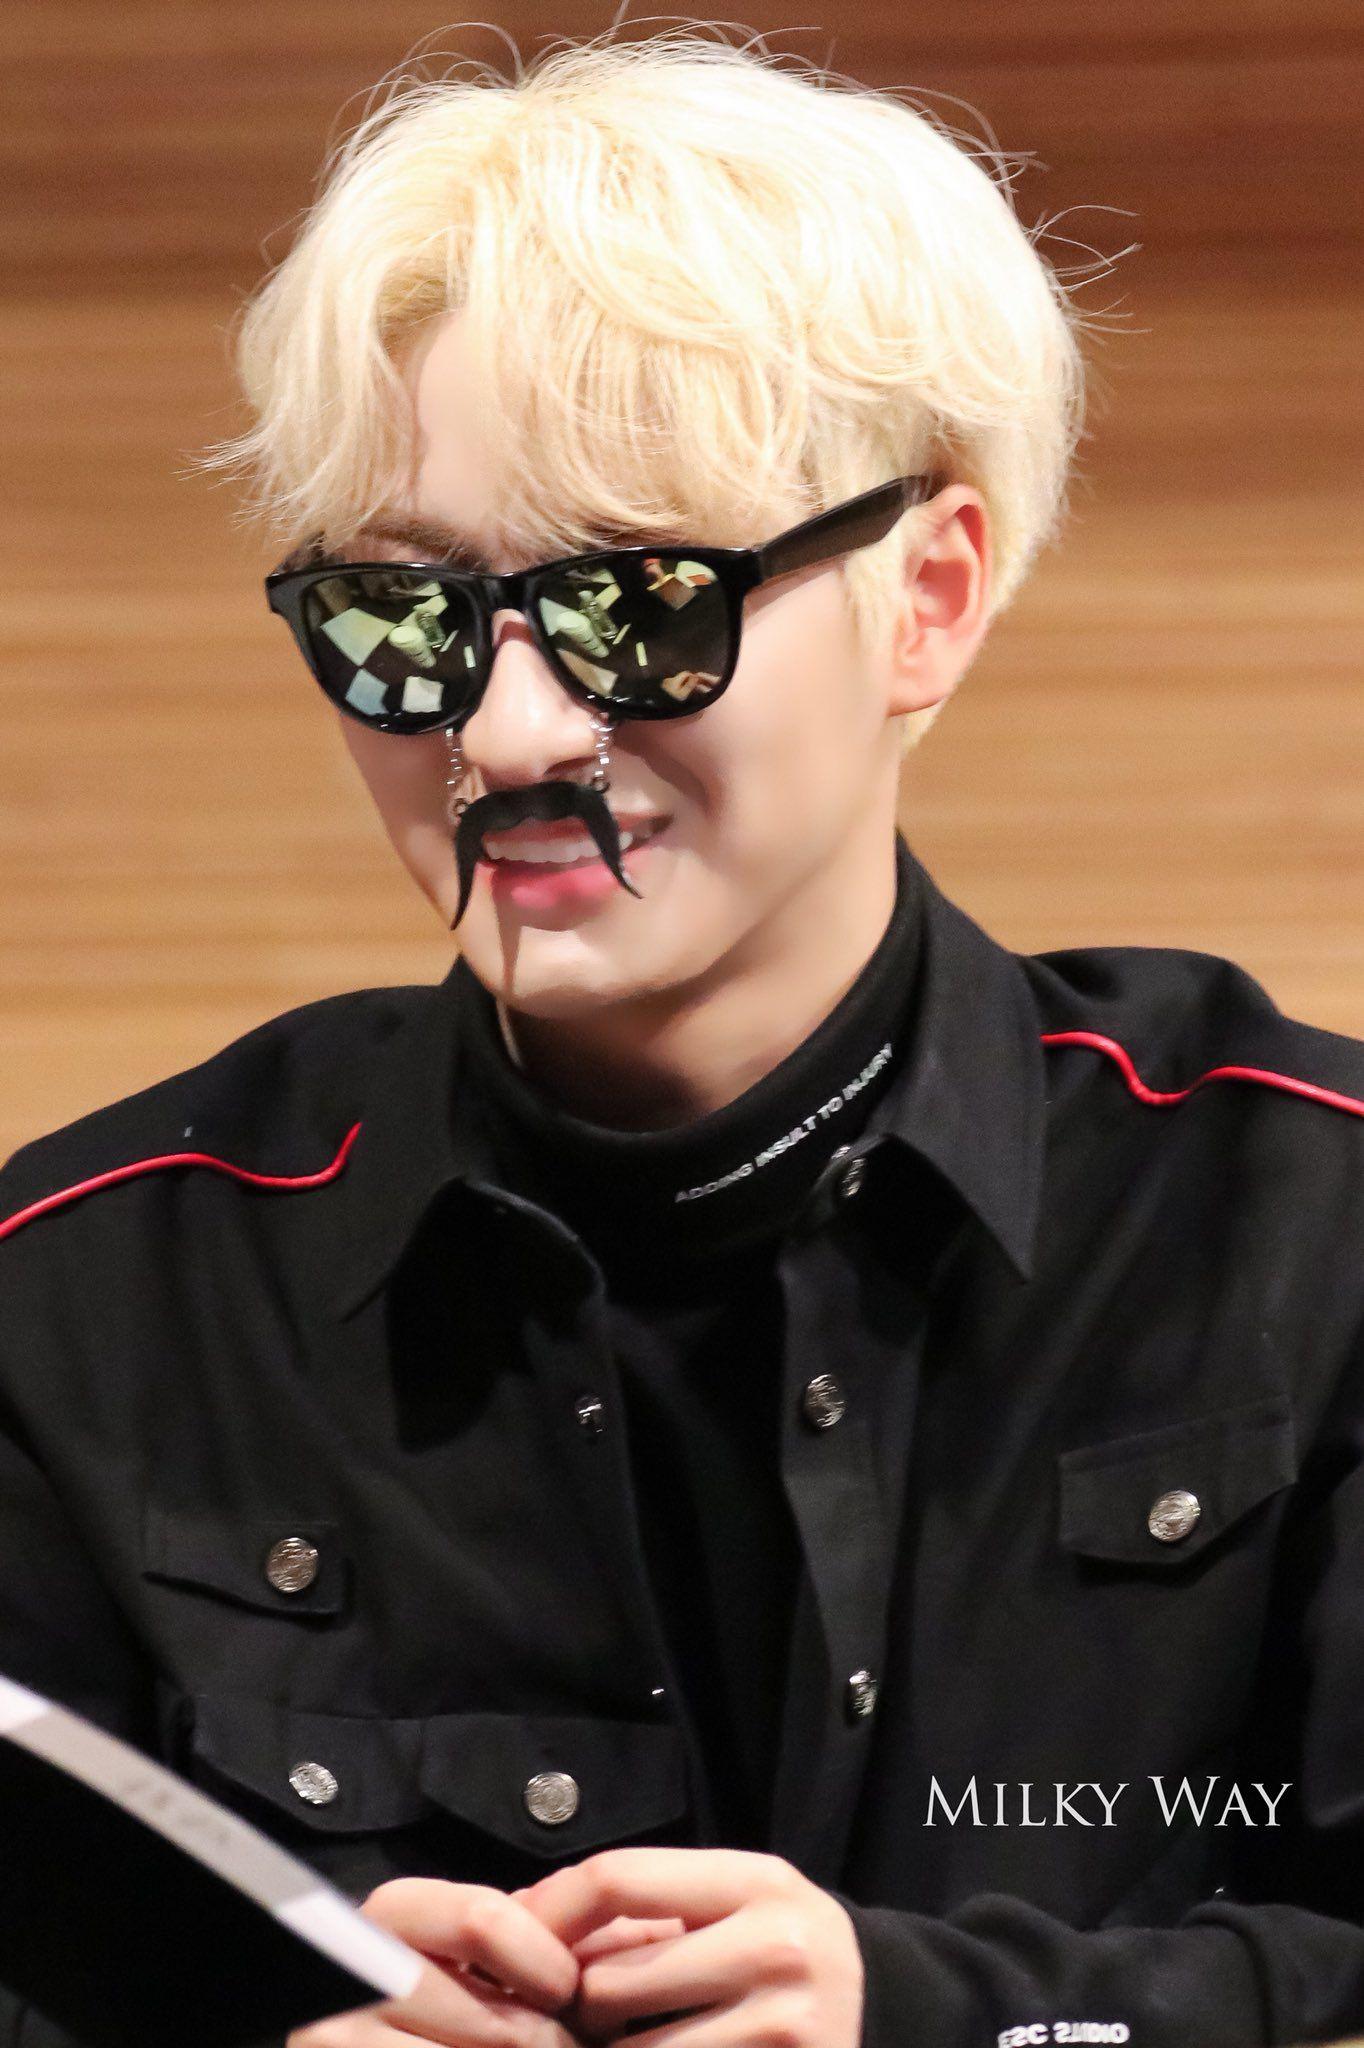 Pin by kαmílα on ᴀᴛᴇᴇᴢ. ʜᴅ Mens sunglasses, Sunglasses, Pics